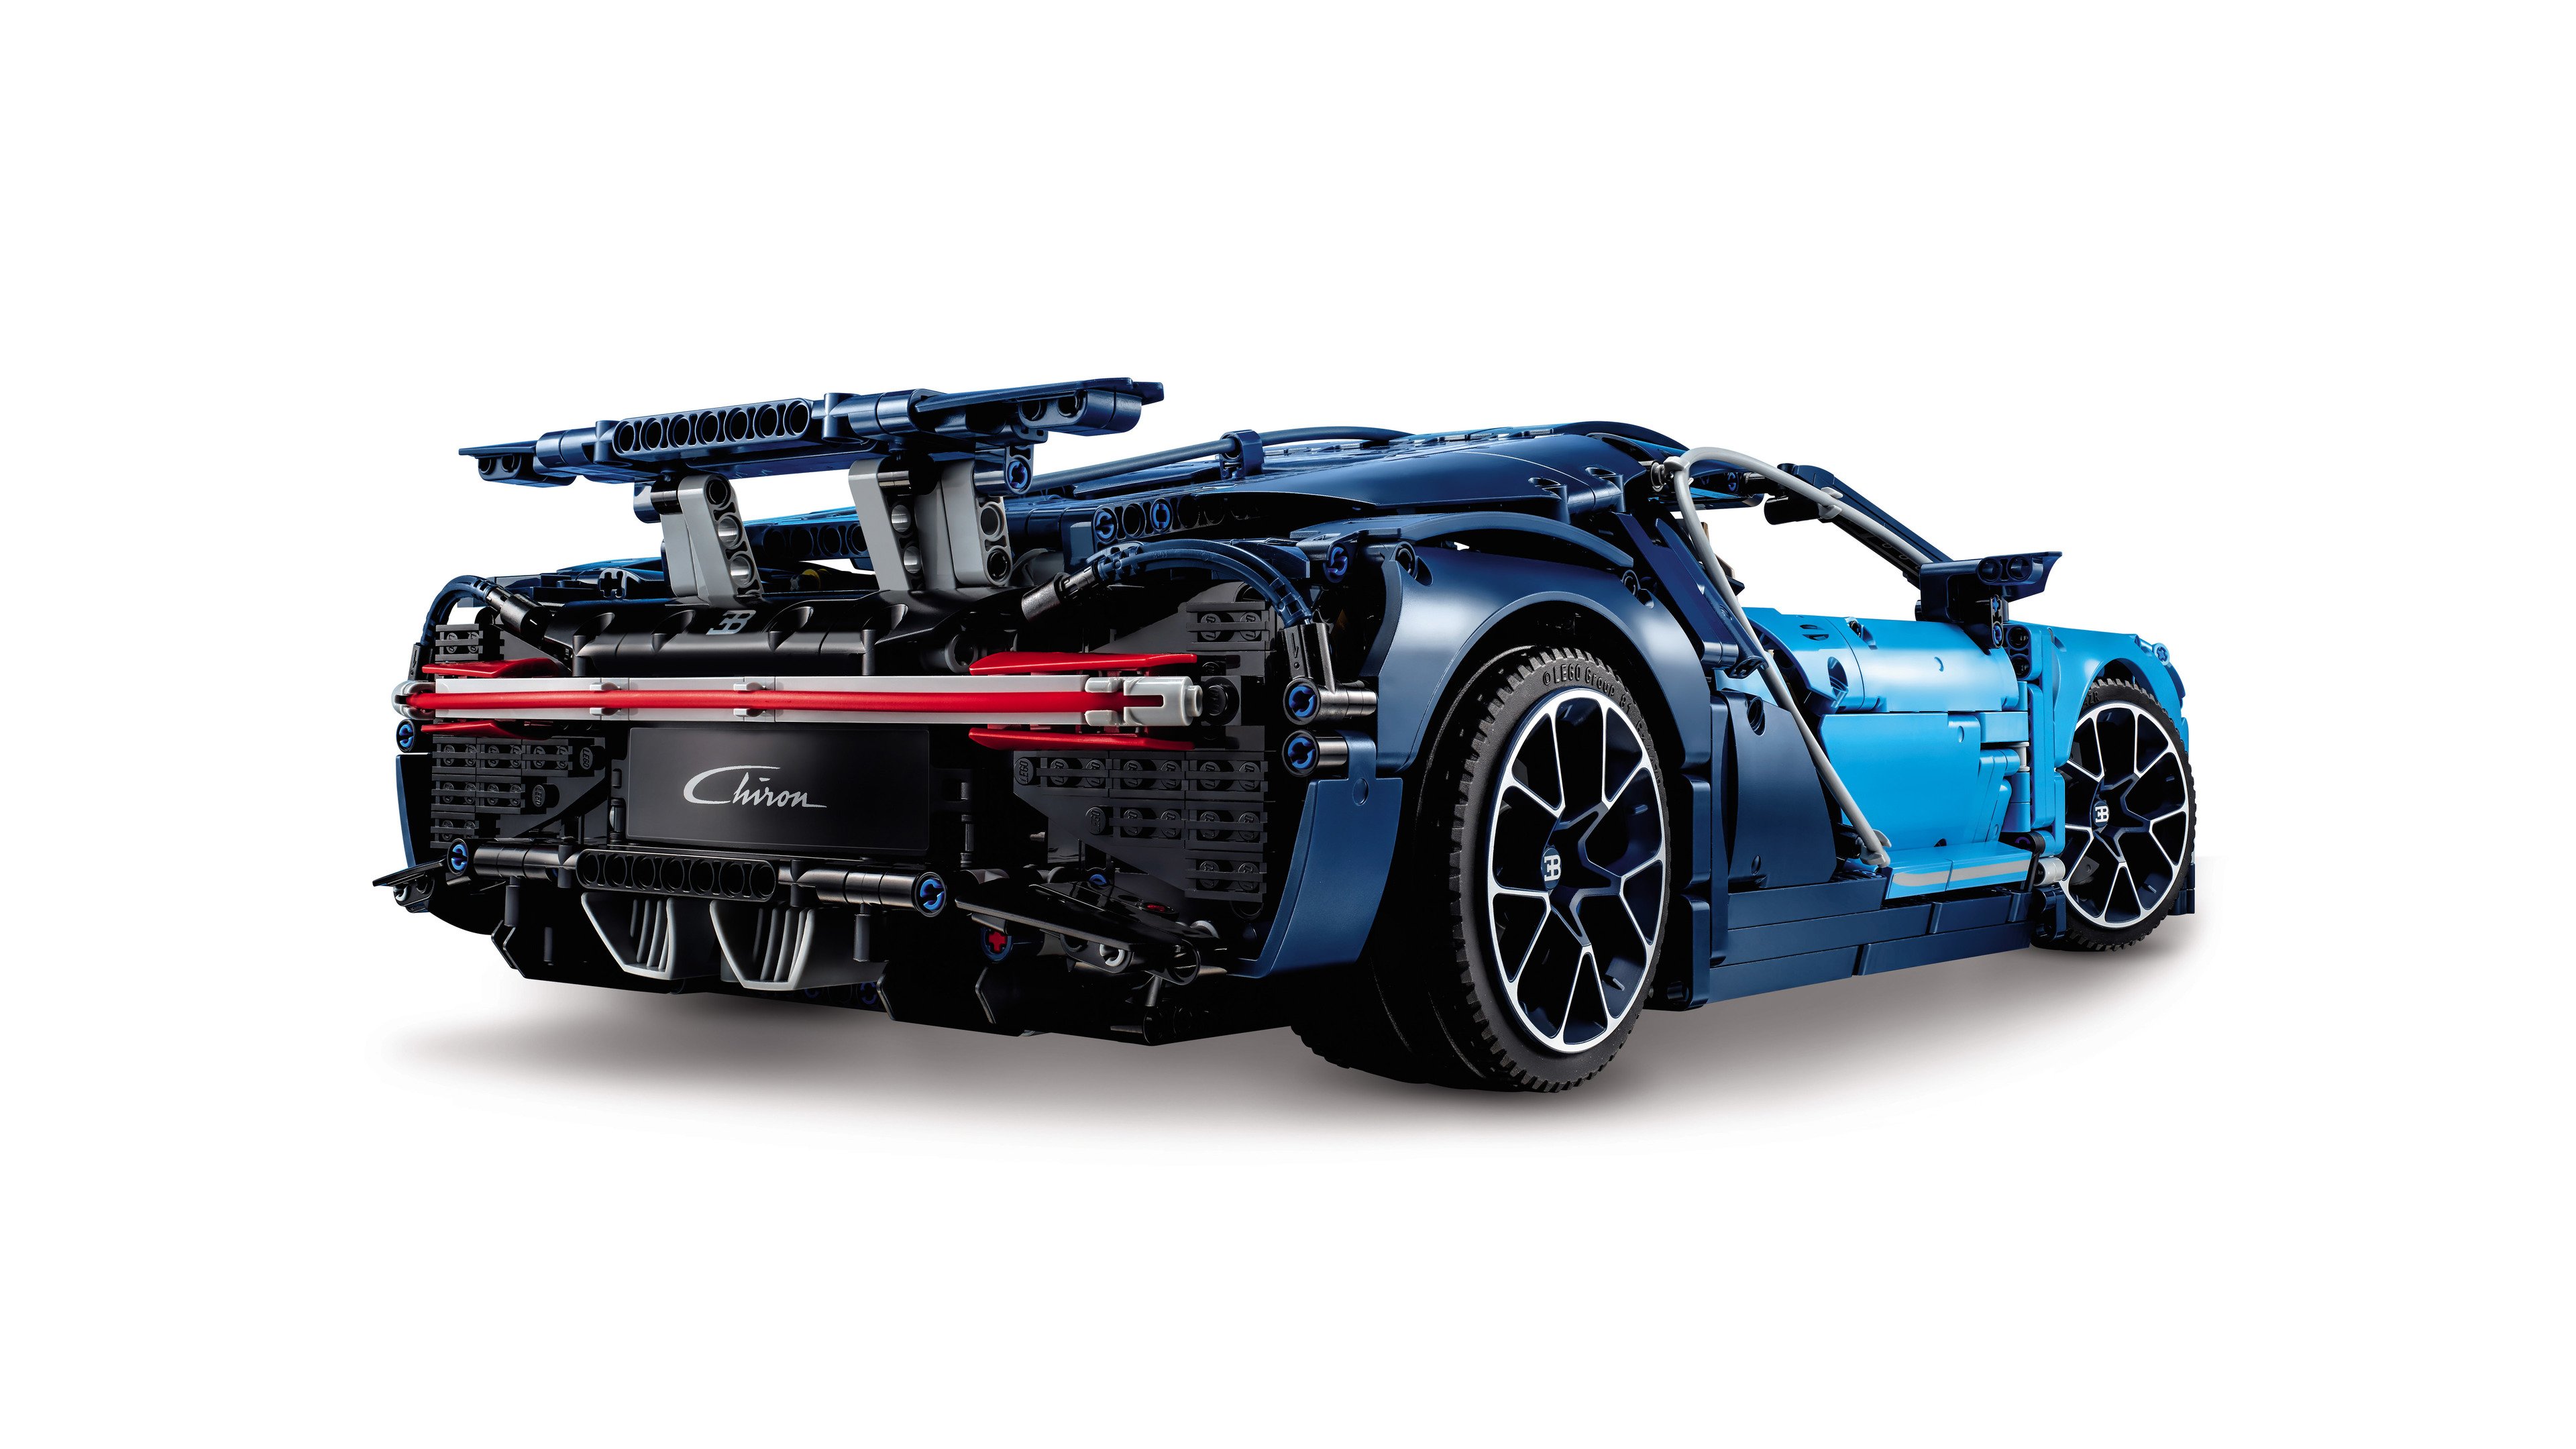 lego bugatti chiron sport 8k car 1539111590 - Lego Bugatti Chiron Sport 8k Car - lego wallpapers, hd-wallpapers, cars wallpapers, bugatti wallpapers, bugatti chiron wallpapers, 8k wallpapers, 5k wallpapers, 4k-wallpapers, 2018 cars wallpapers